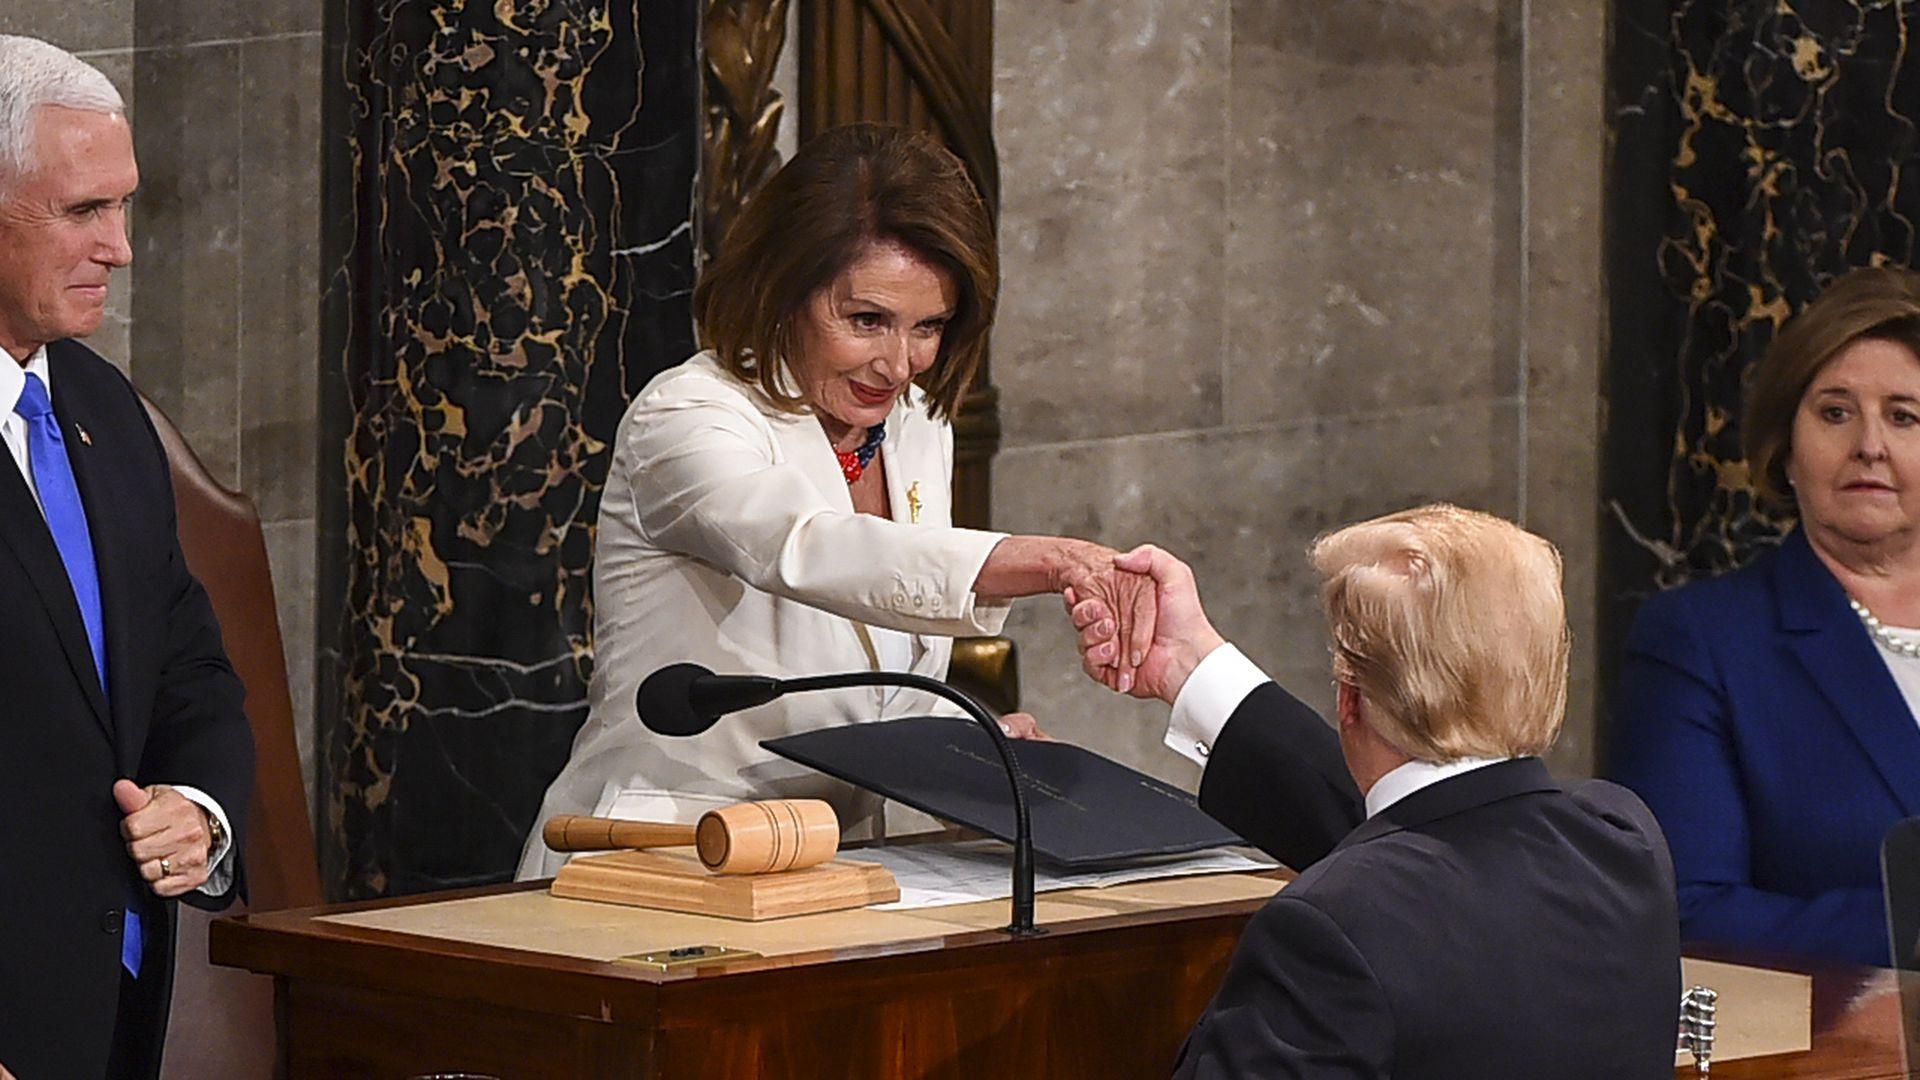 House Speaker Nancy Pelosi greets President Trump.